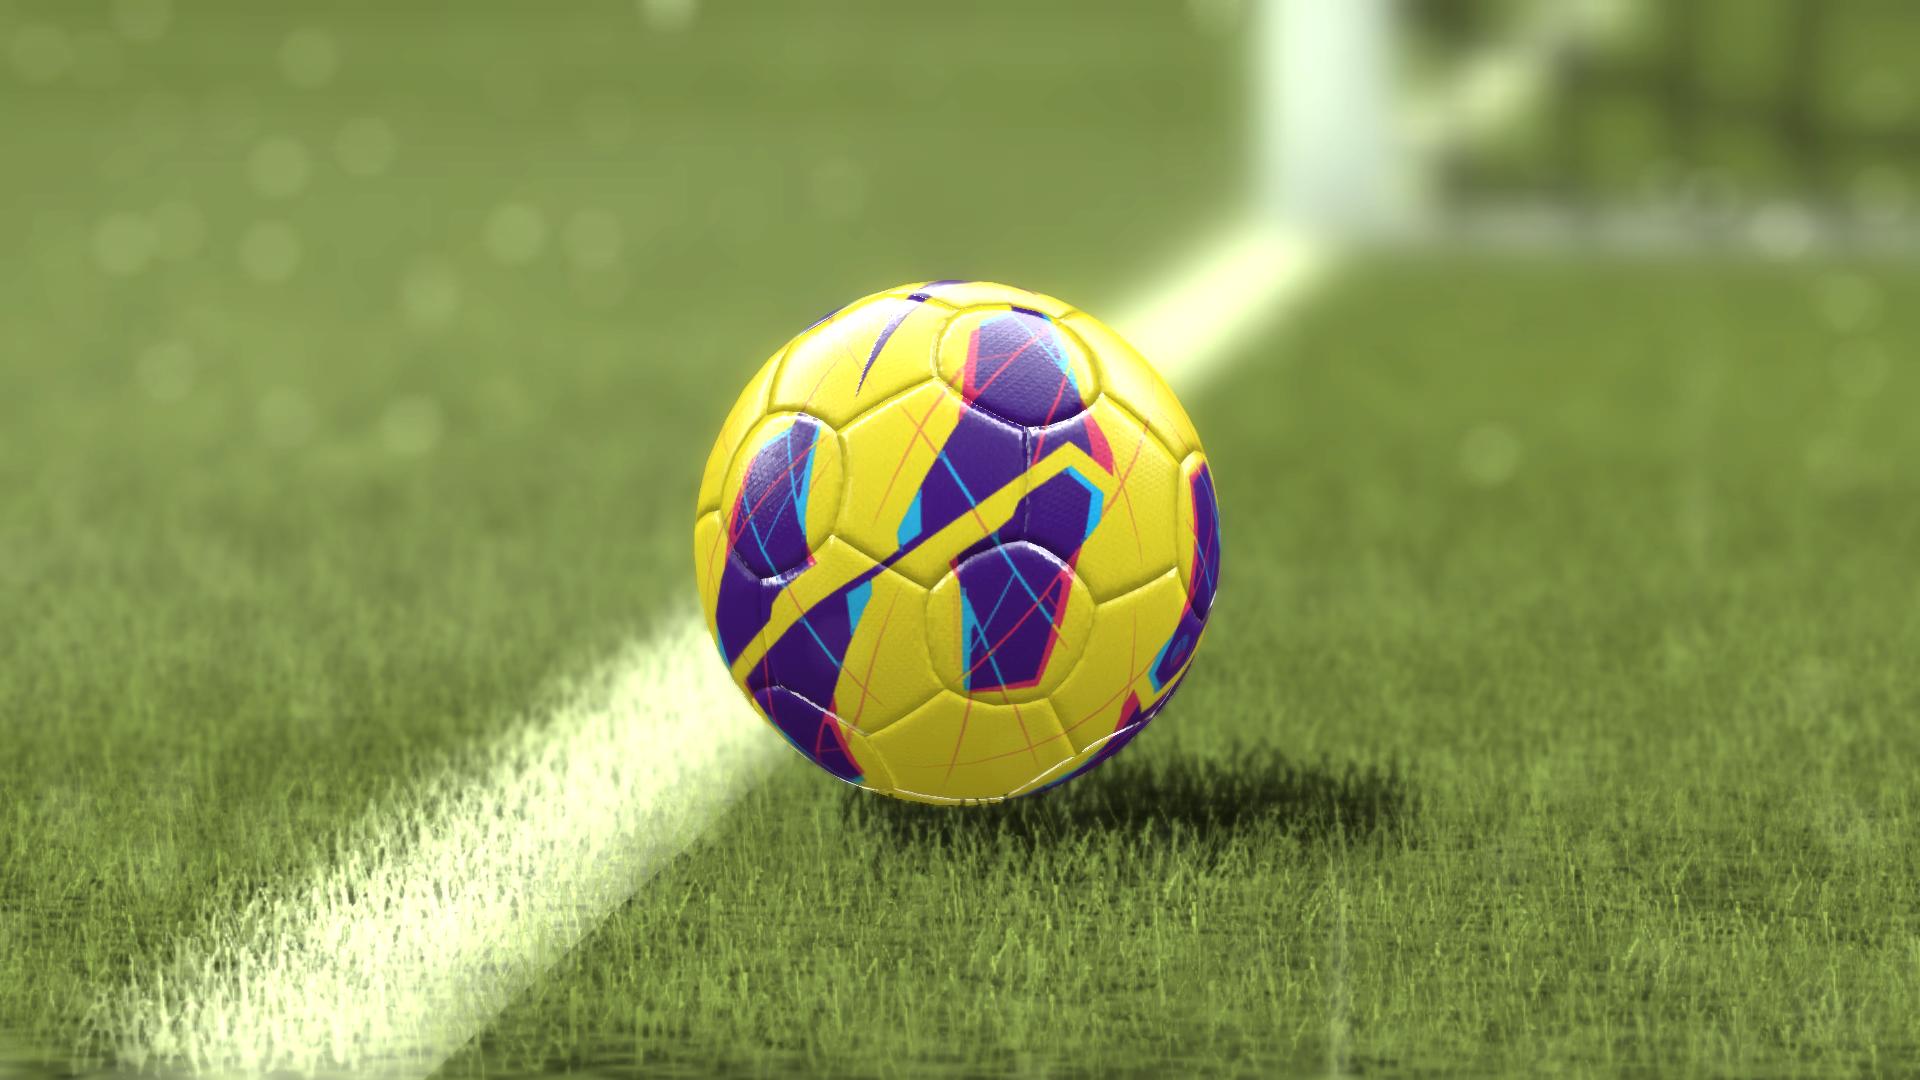 Img Full Hd Football 1920x1080 Download Hd Wallpaper Wallpapertip